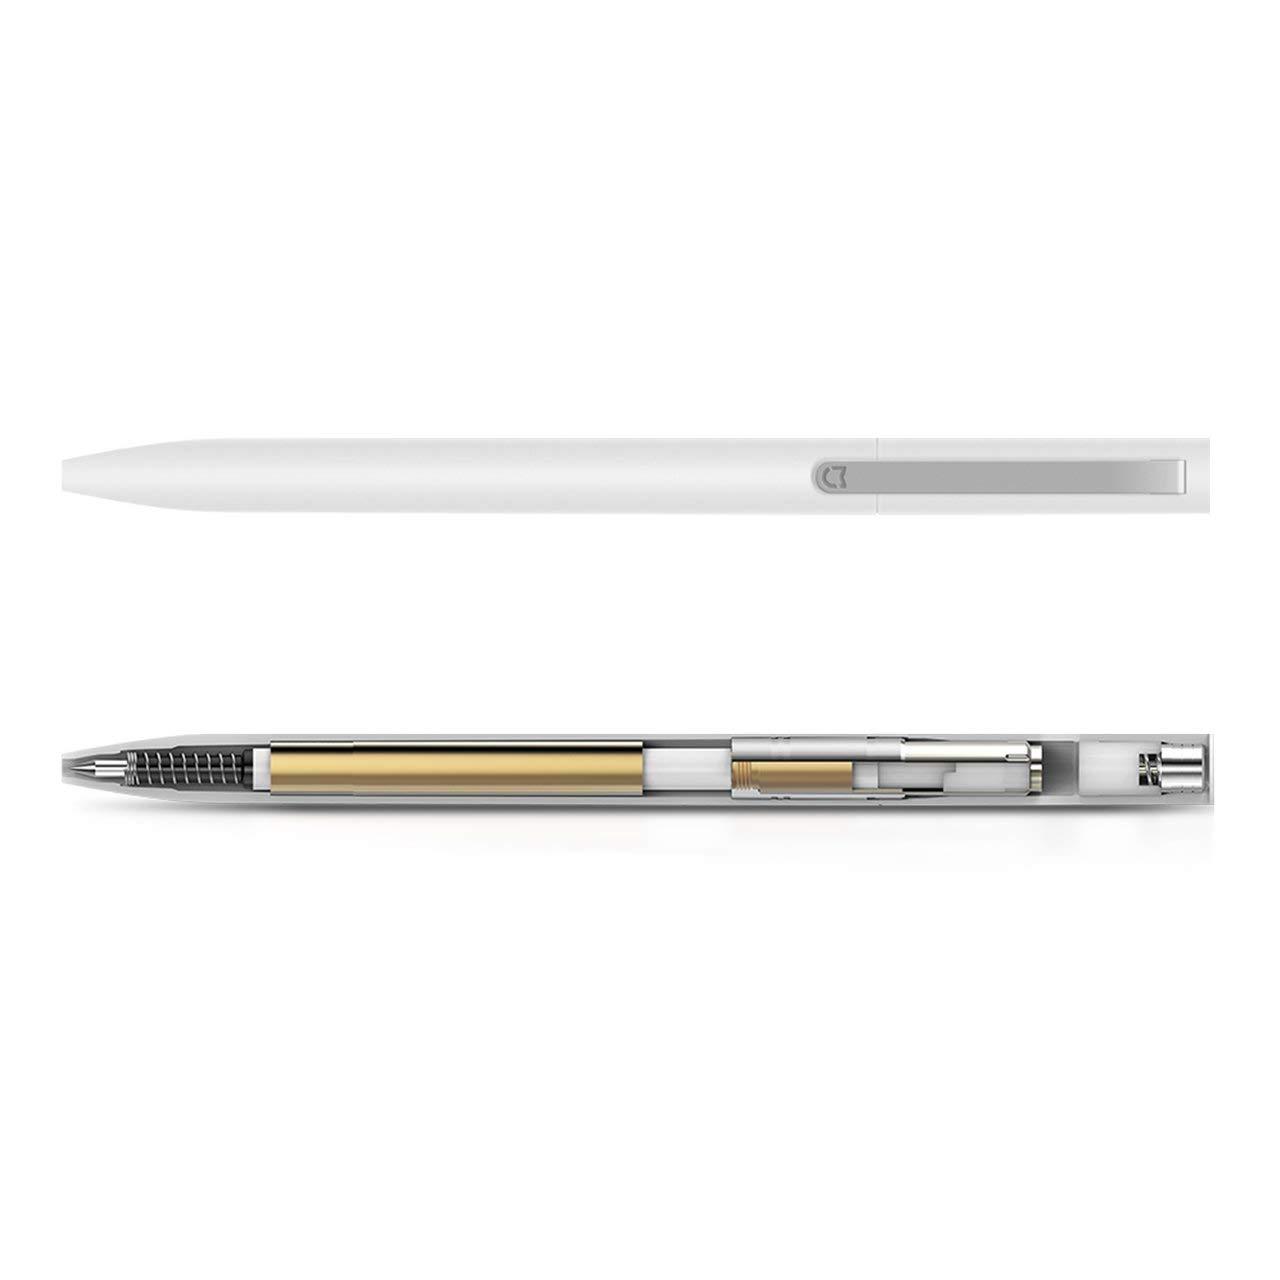 Bianco Jasnyfall Penne Xiaomi Mijia Universal Roller Durable Smooth Signing Pen con Disegno Retrattile e Ricaricabile Bianco